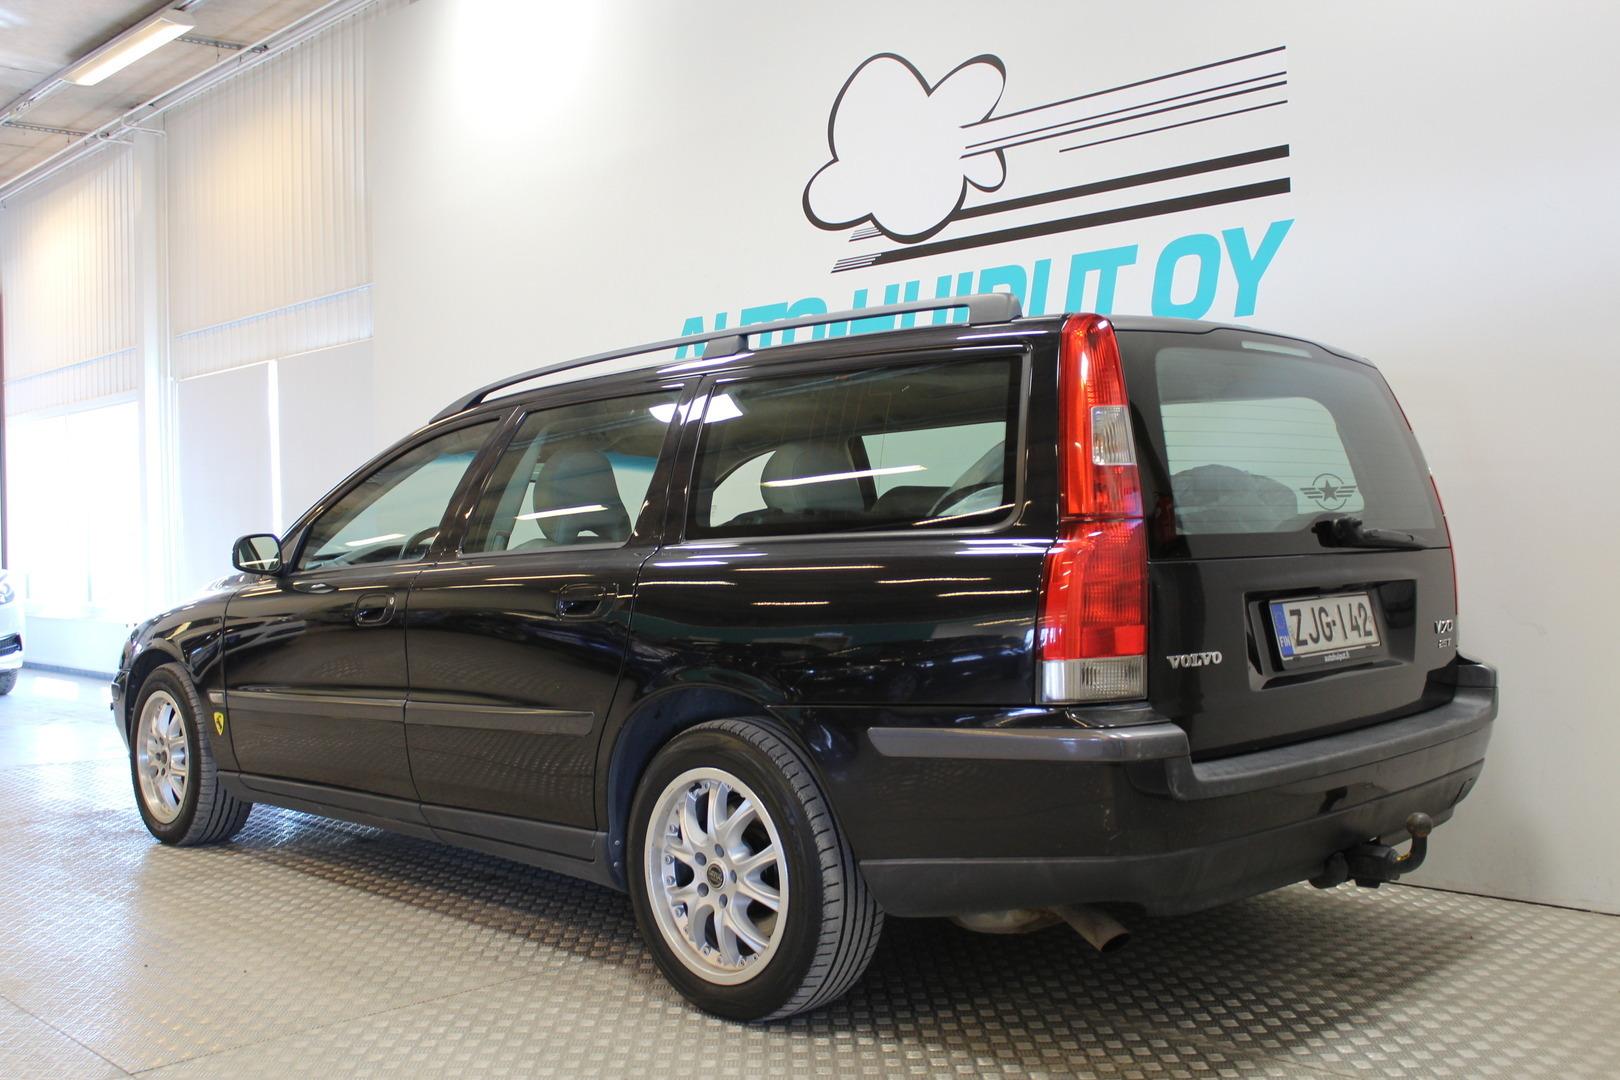 Volvo V70, 2.5T Automatic # Nahat #Vakkari